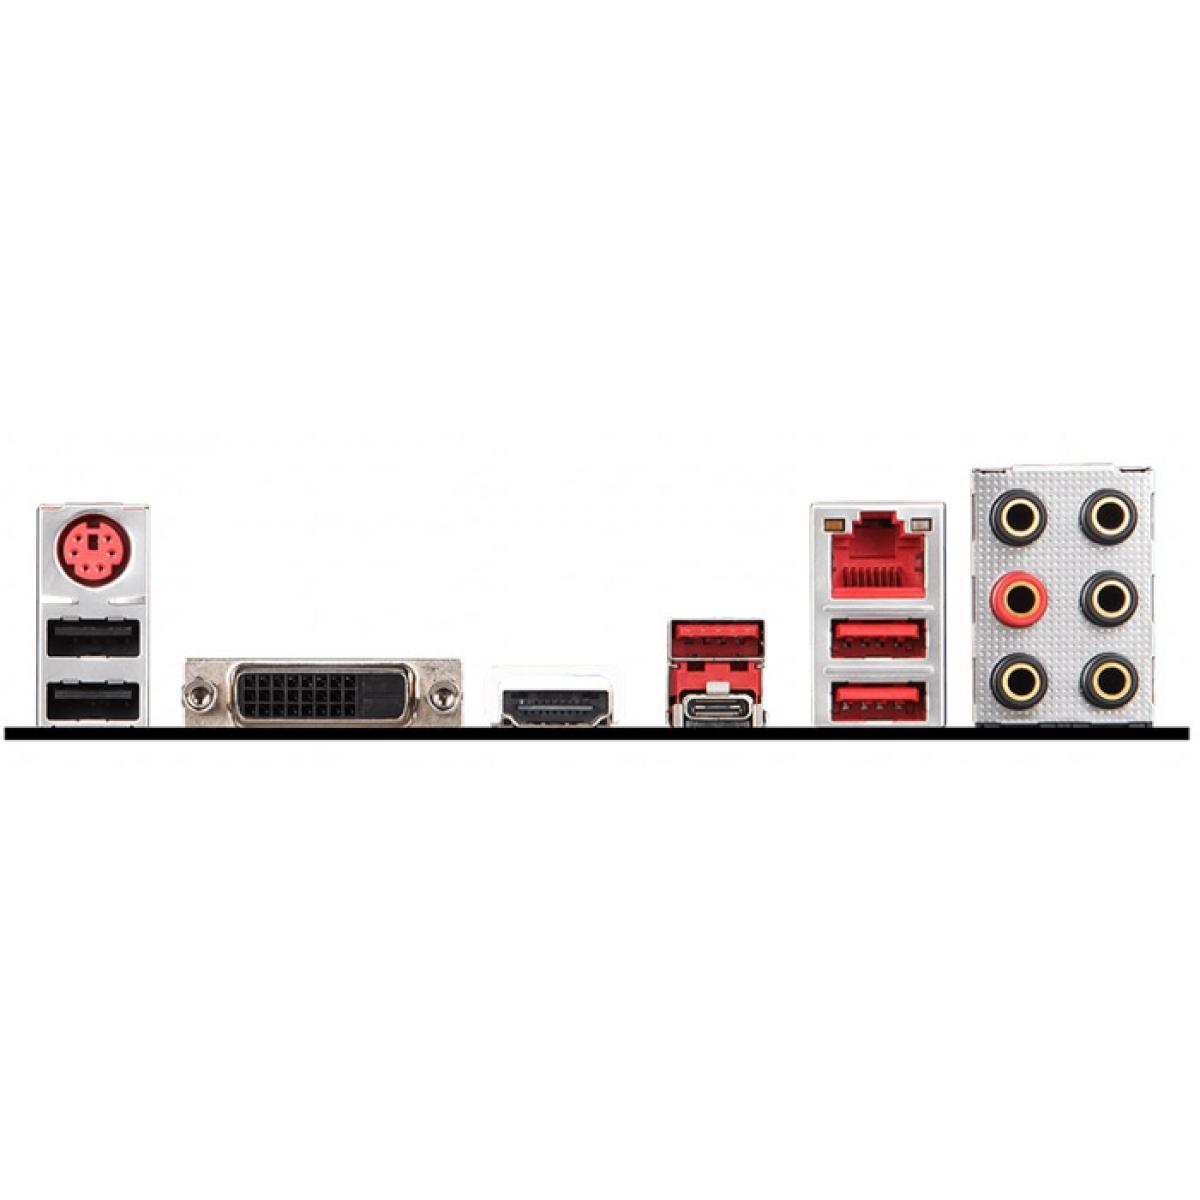 Placa Mãe MSI Z390 Mpg Gaming Plus, Chipset Z390, Intel LGA 1151, ATX, DDR4